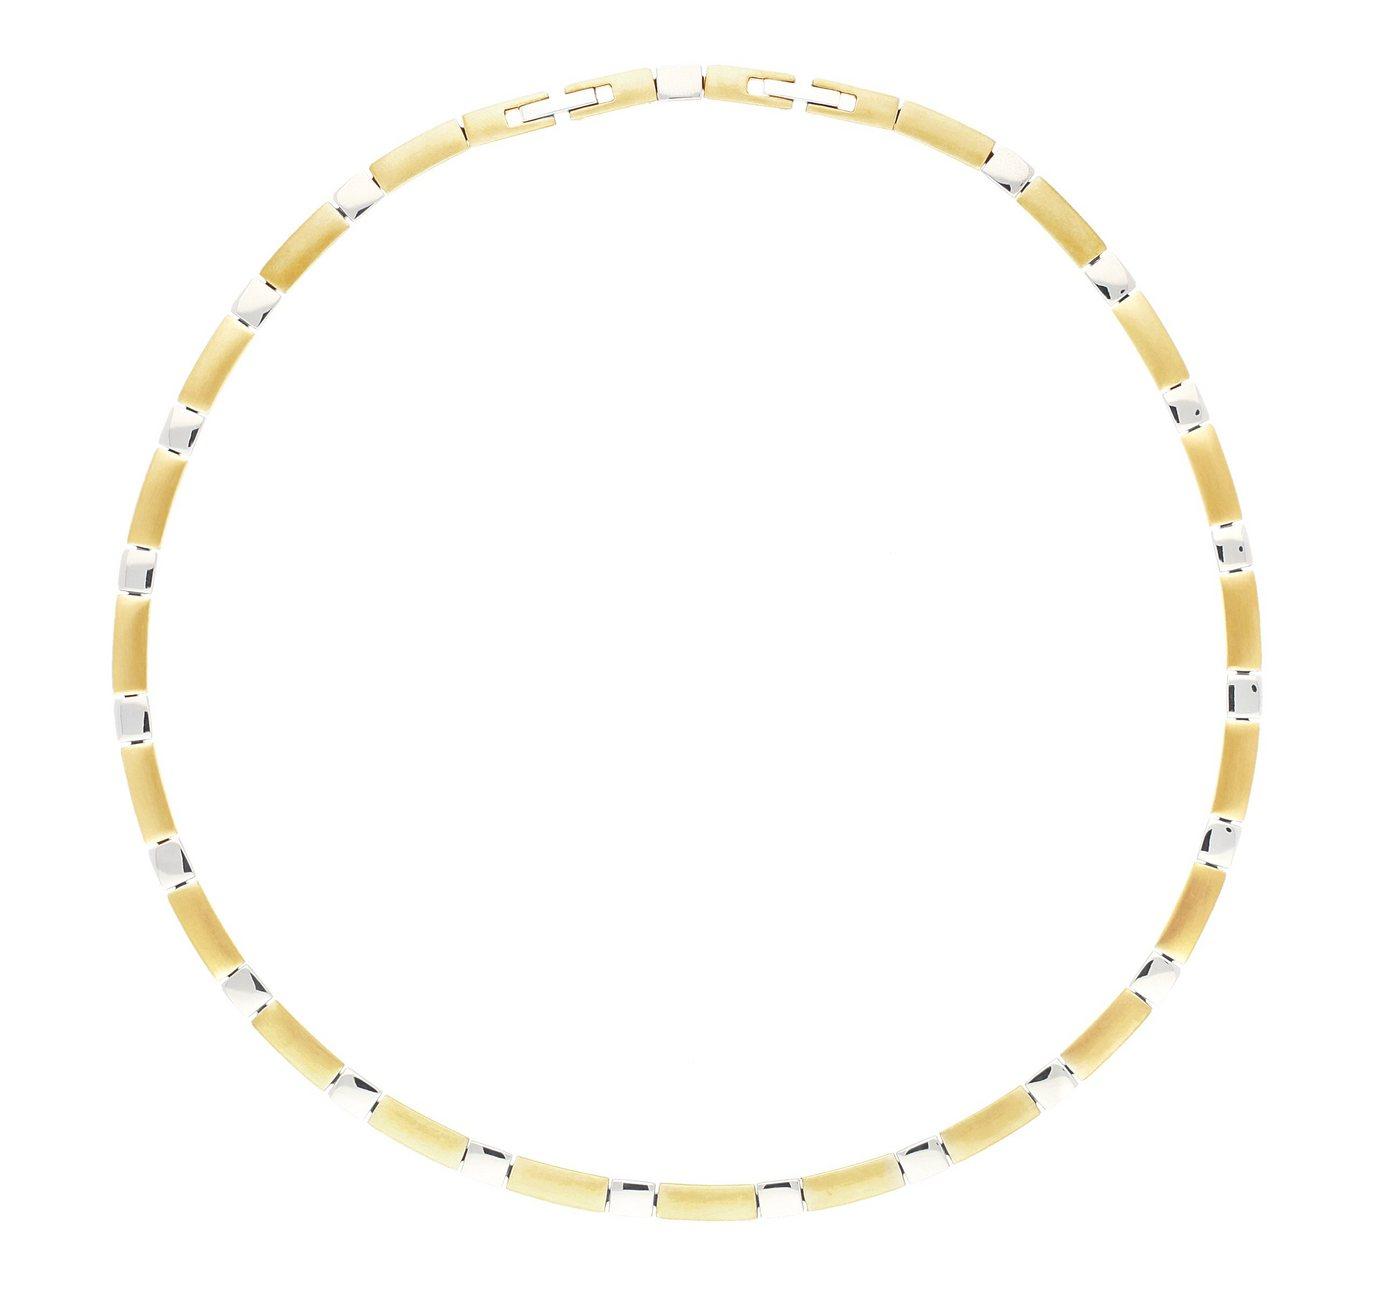 TITANIA Gliederkette »Titancollier« bicolor   Schmuck > Halsketten > Gliederketten   TITANIA